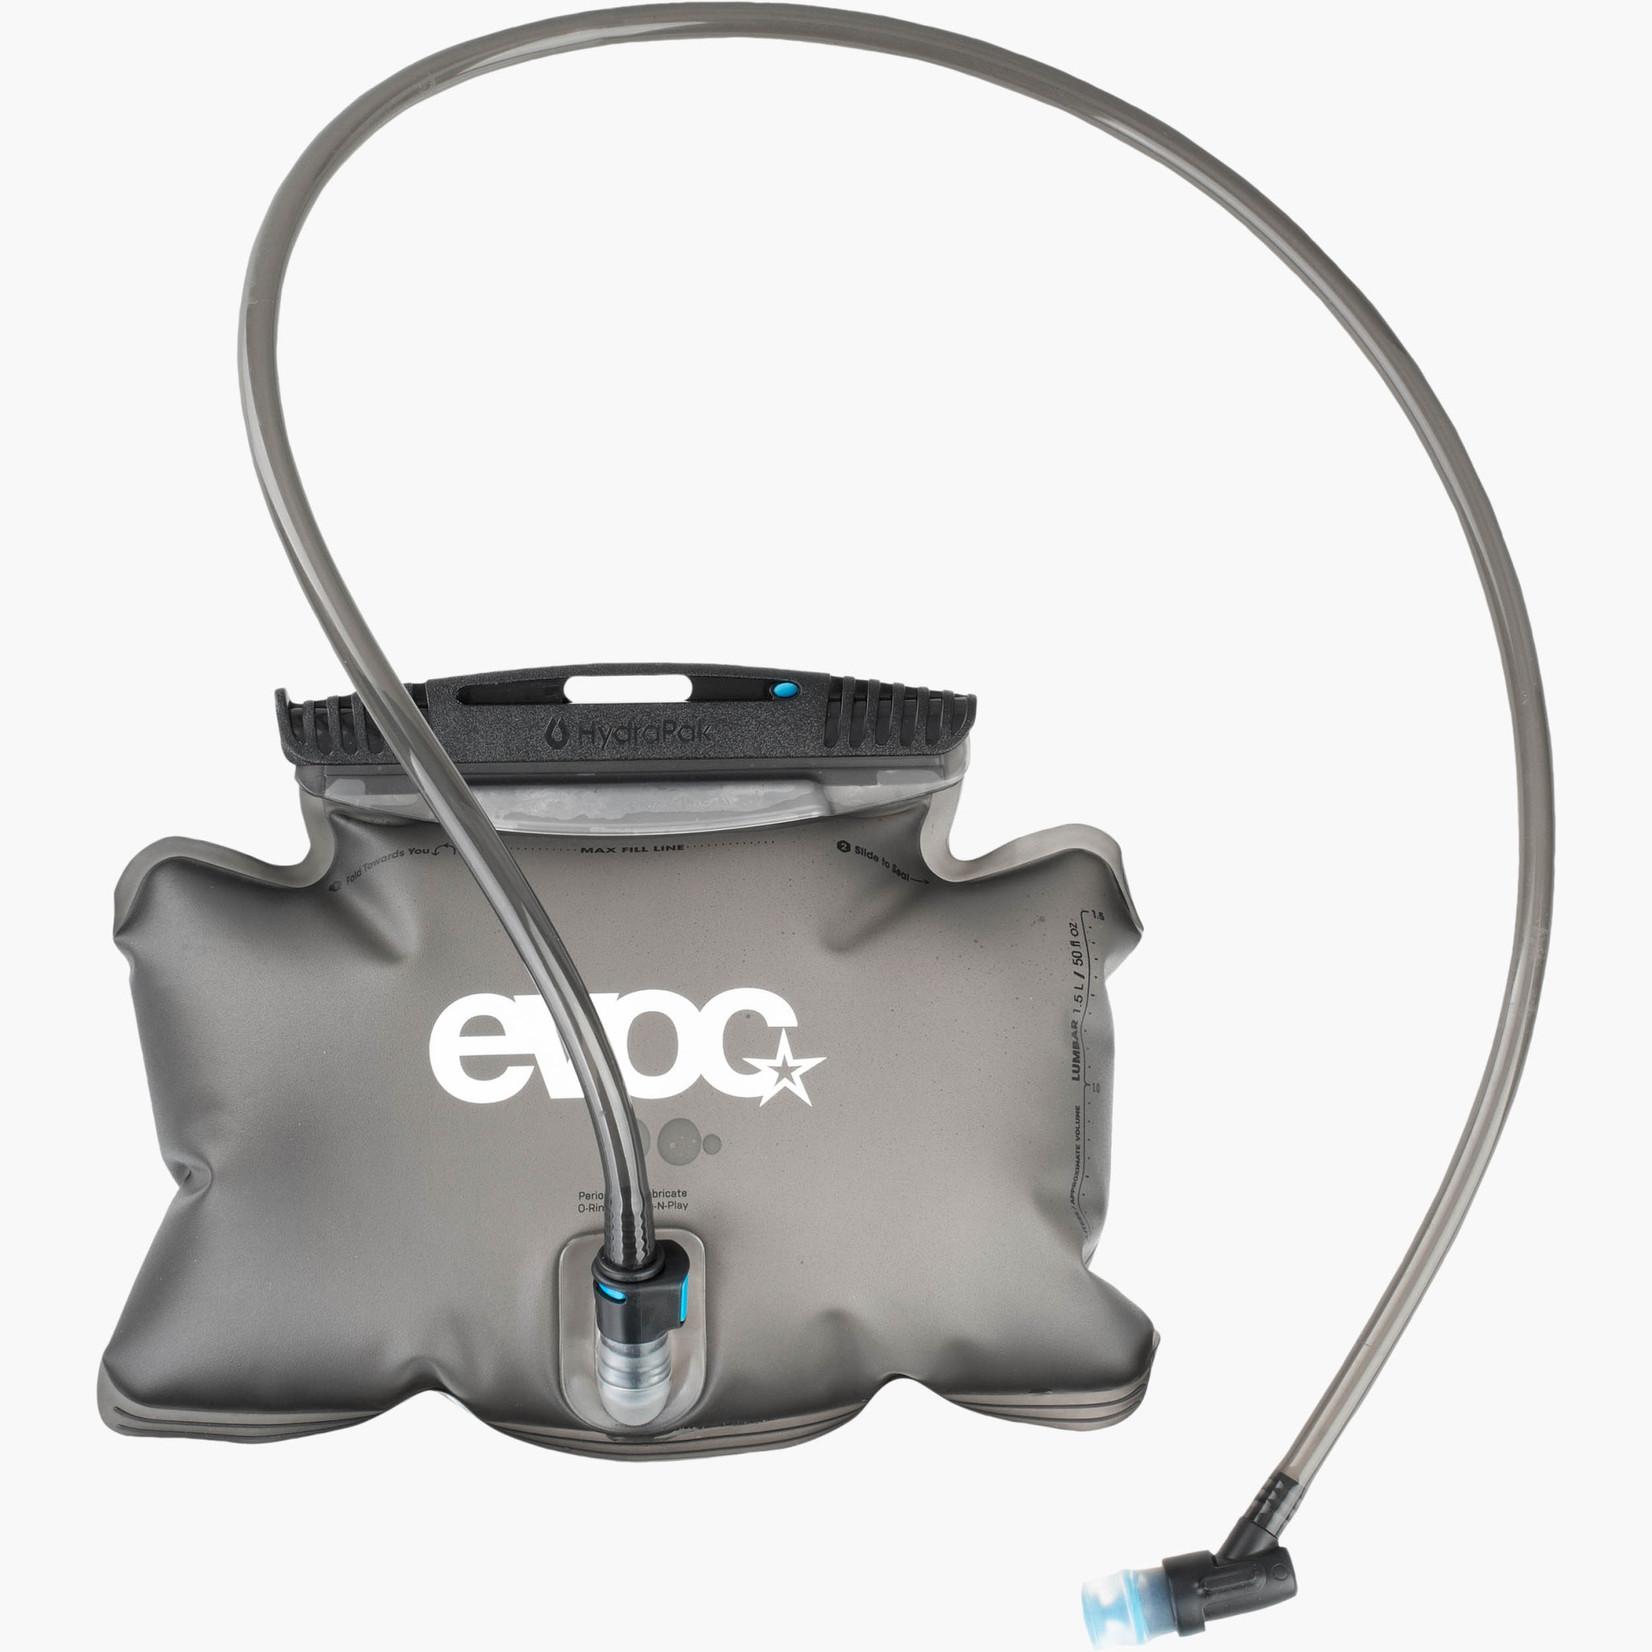 EVOC EVOC Hip Pack Hydration Bladder 1,5l